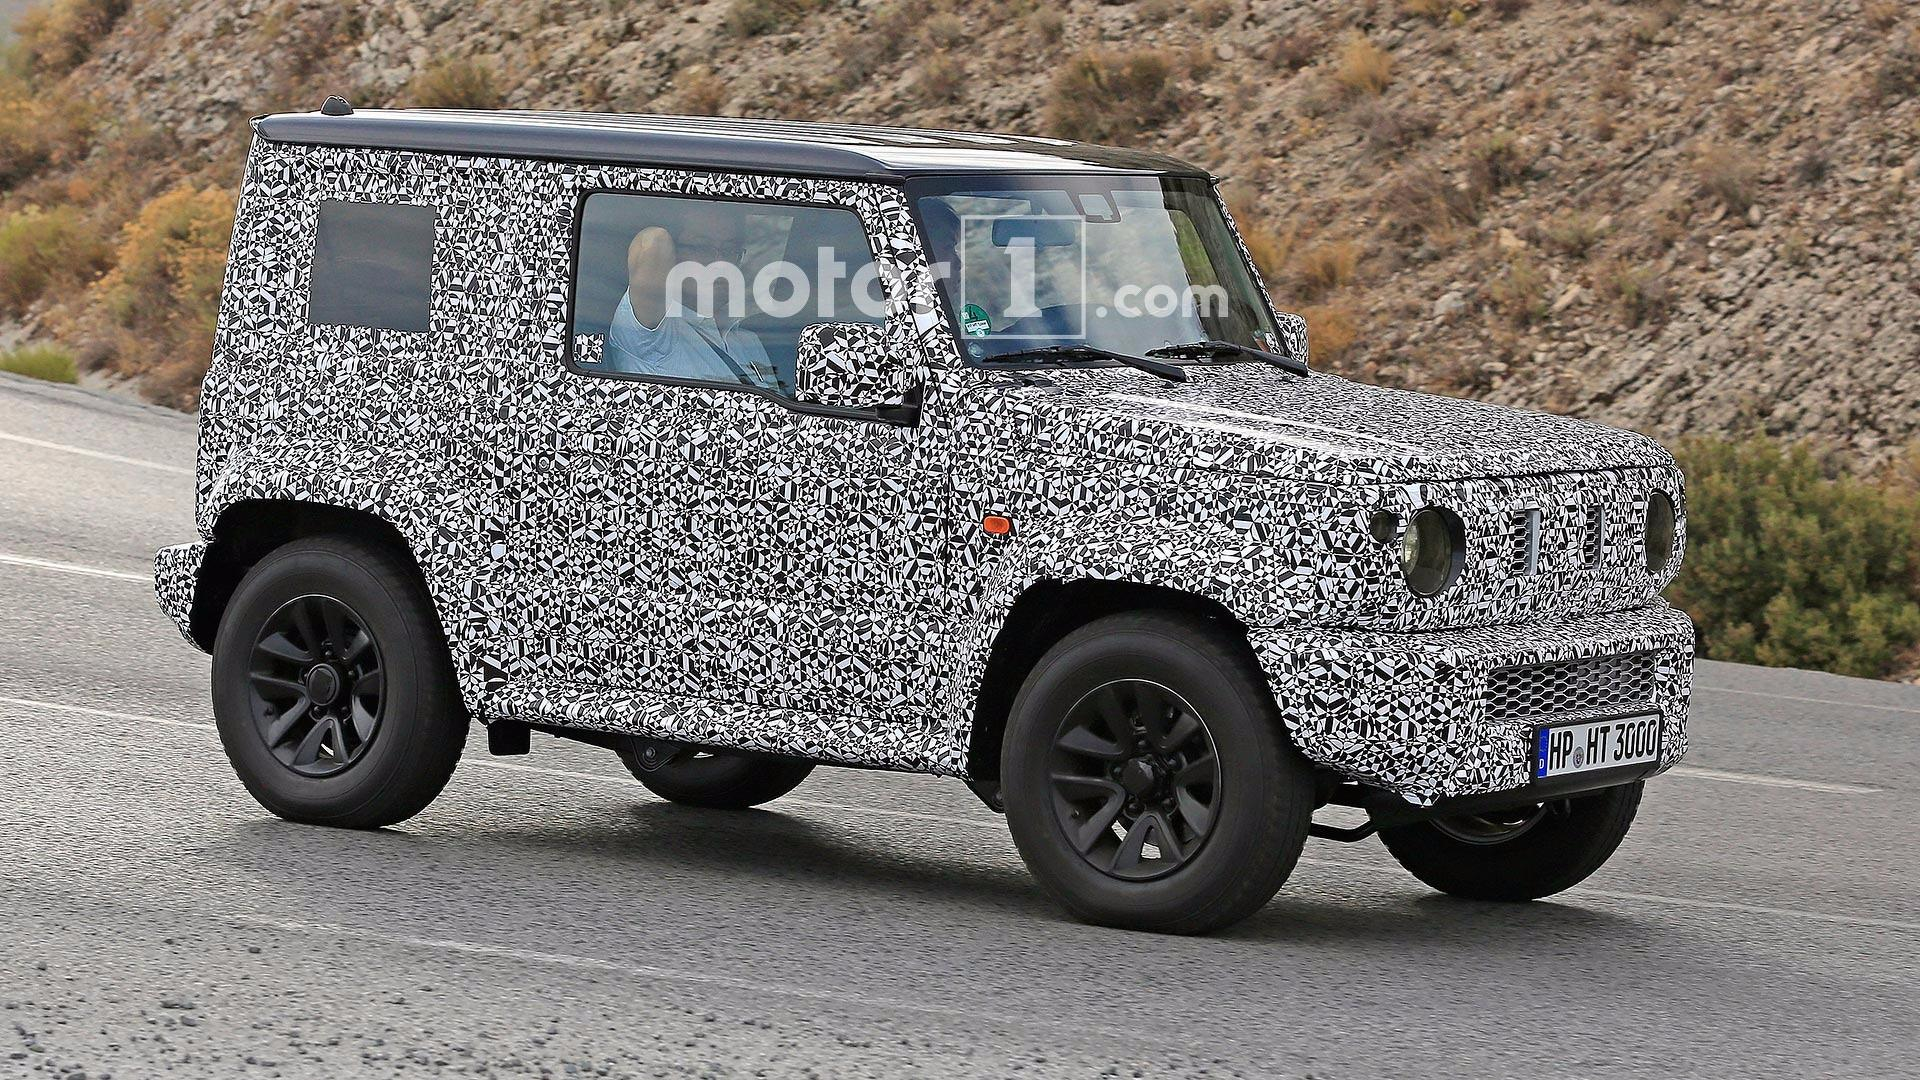 2018 suzuki jeep.  Jeep On 2018 Suzuki Jeep M